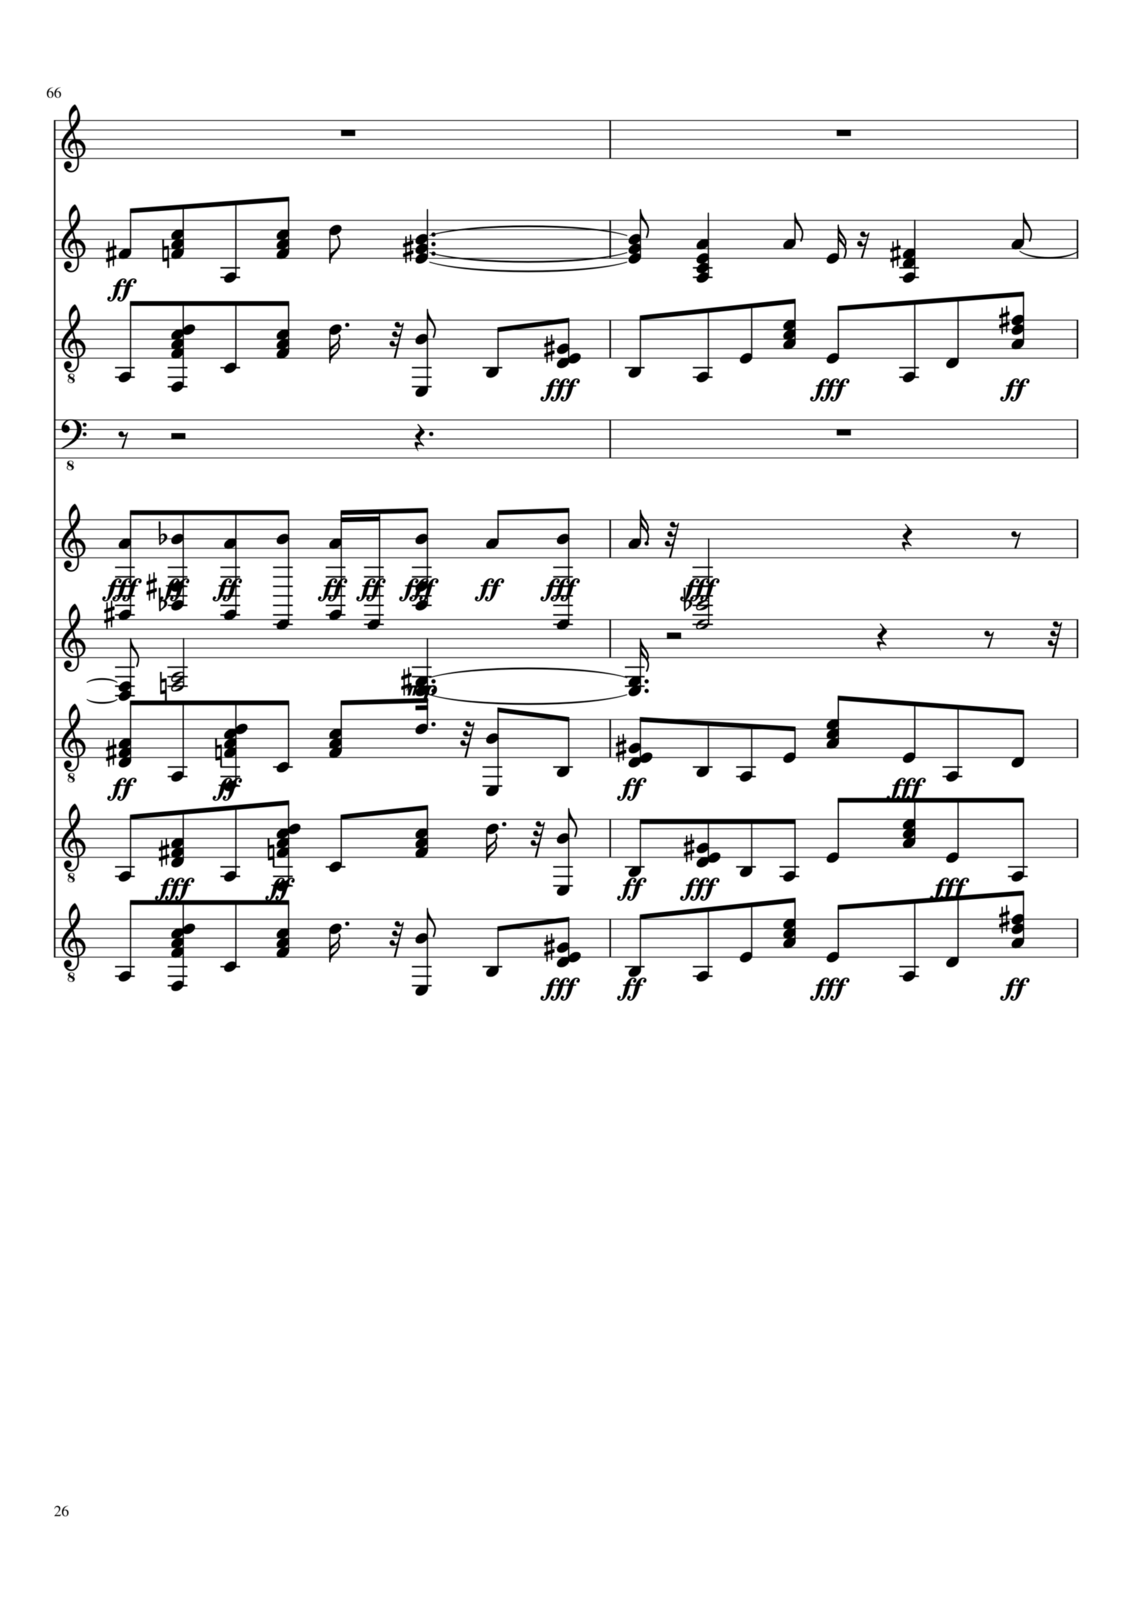 18 berez slide, Image 26